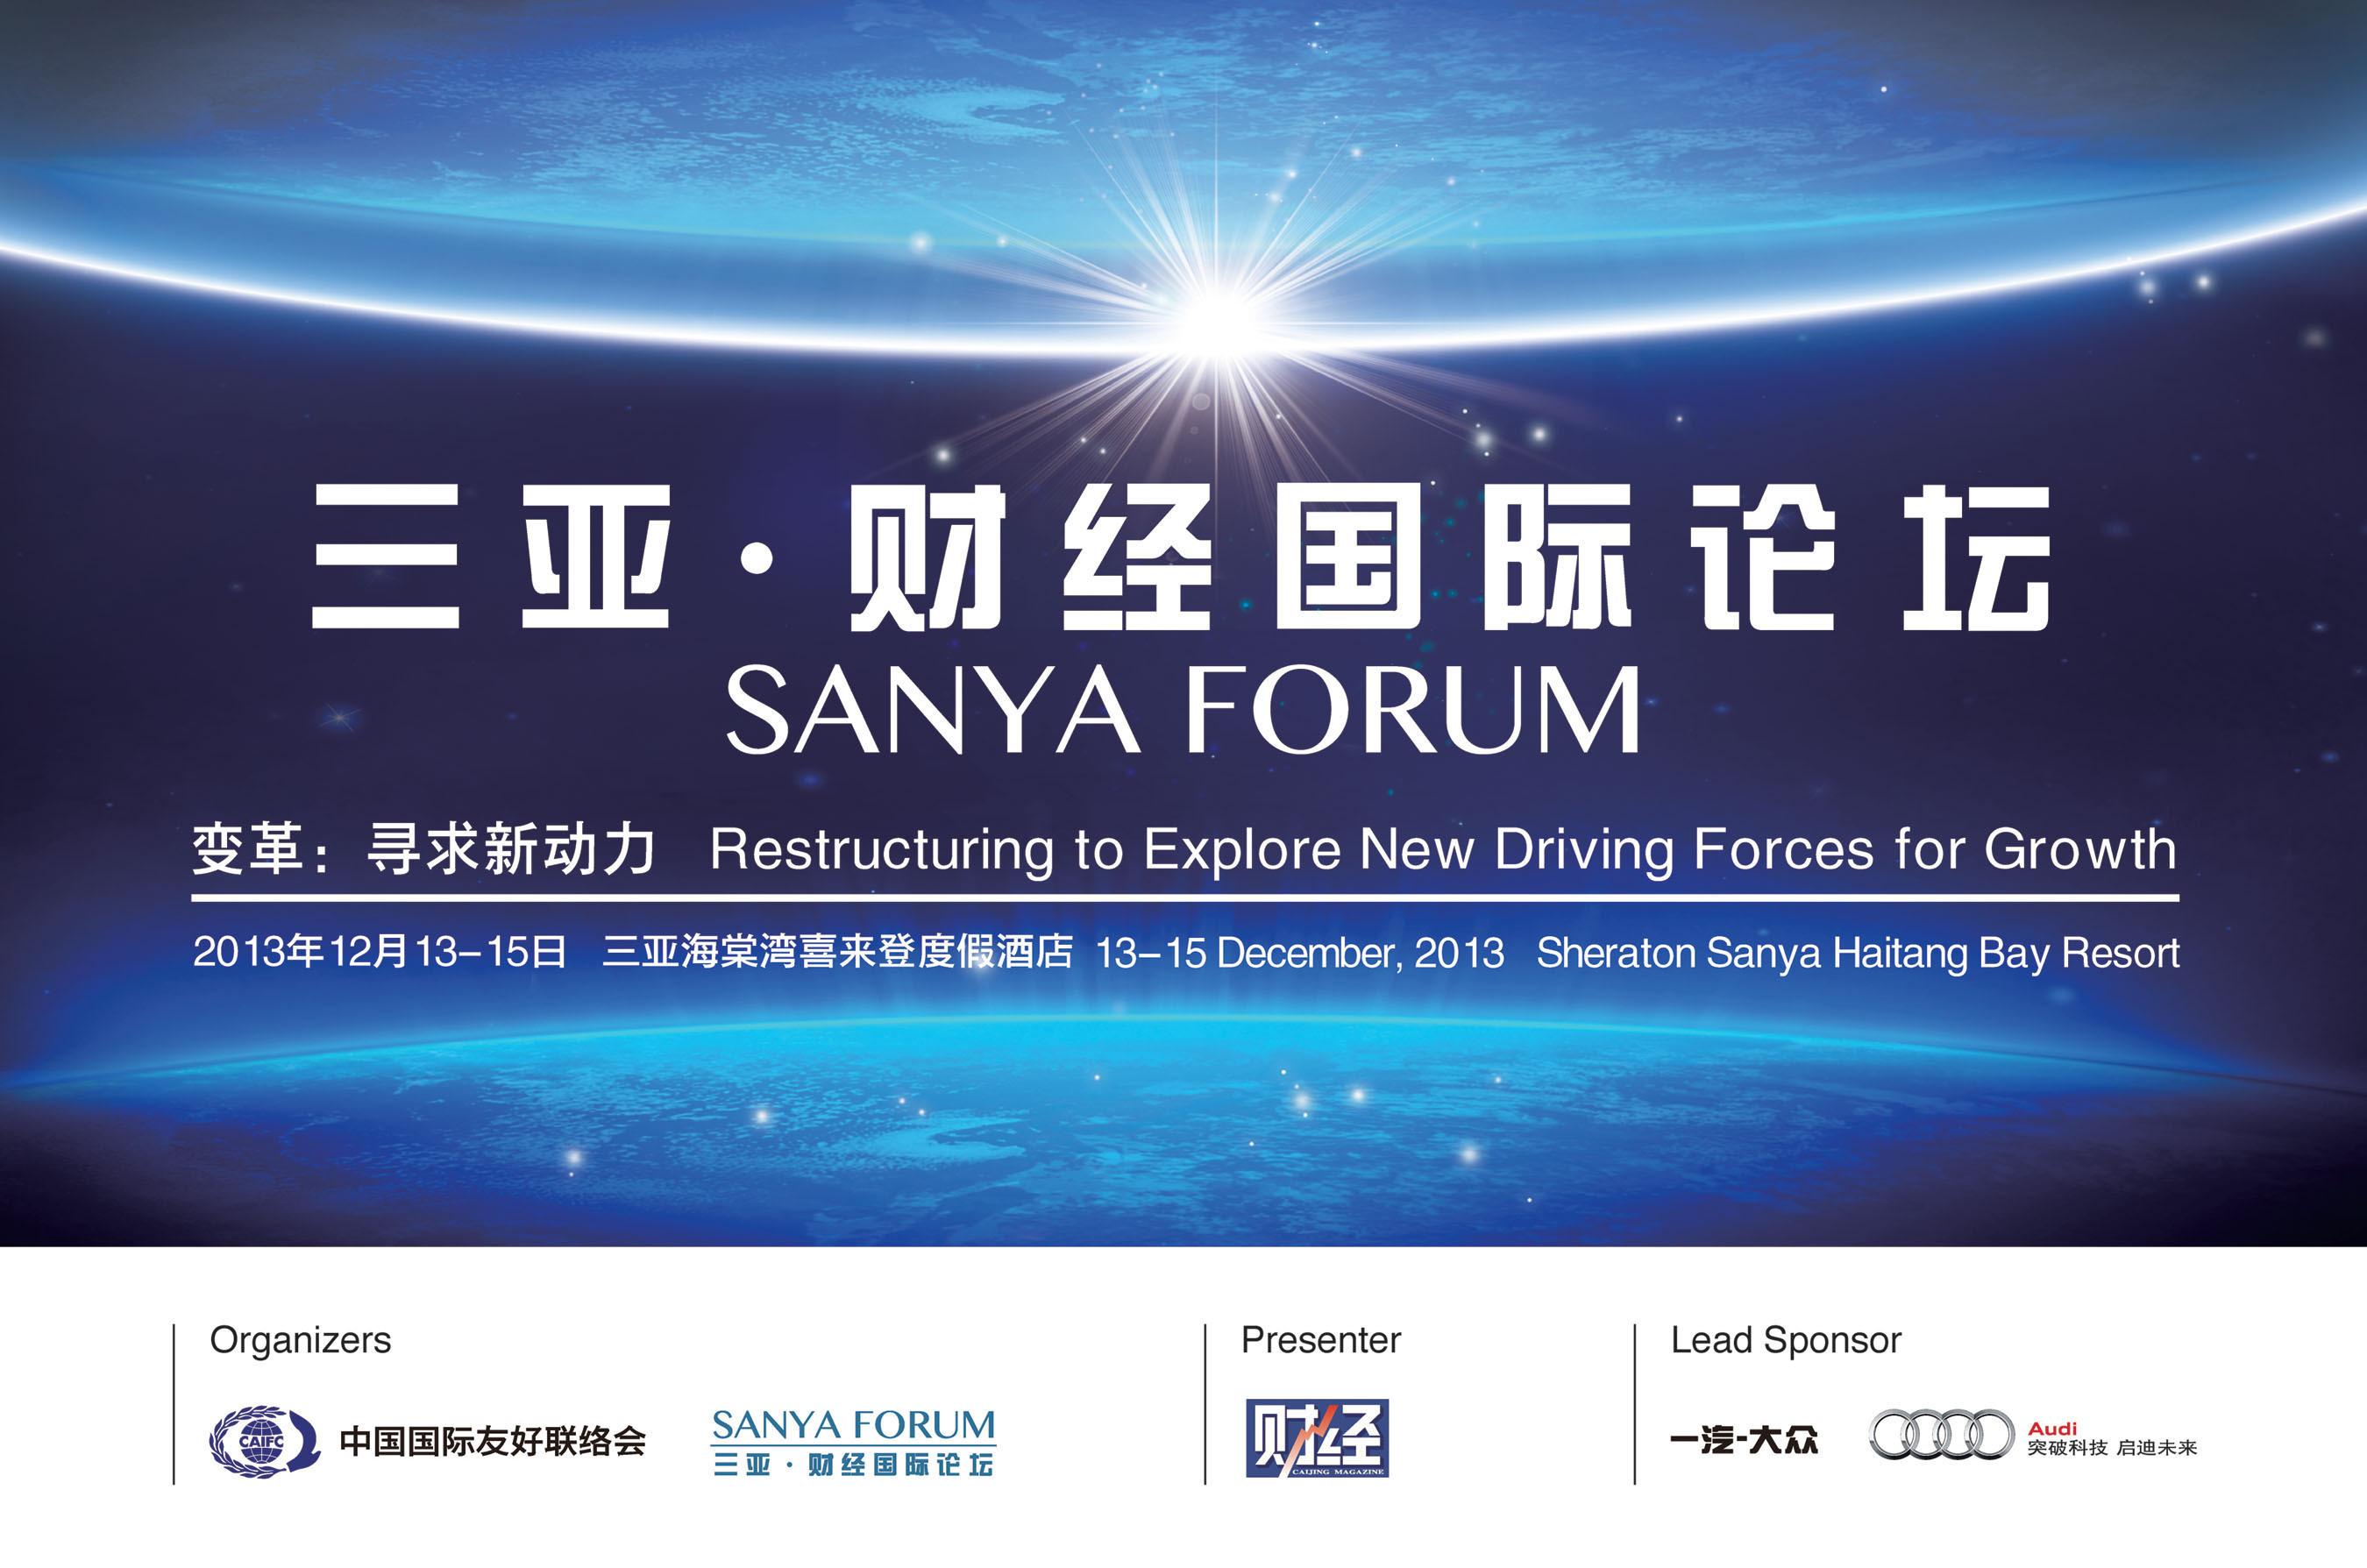 The Sanya Forum 2013 will take place on December 13-15 in Sanya, Hainan. (PRNewsFoto/CAIJING Magazine) (PRNewsFoto/CAIJING MAGAZINE)